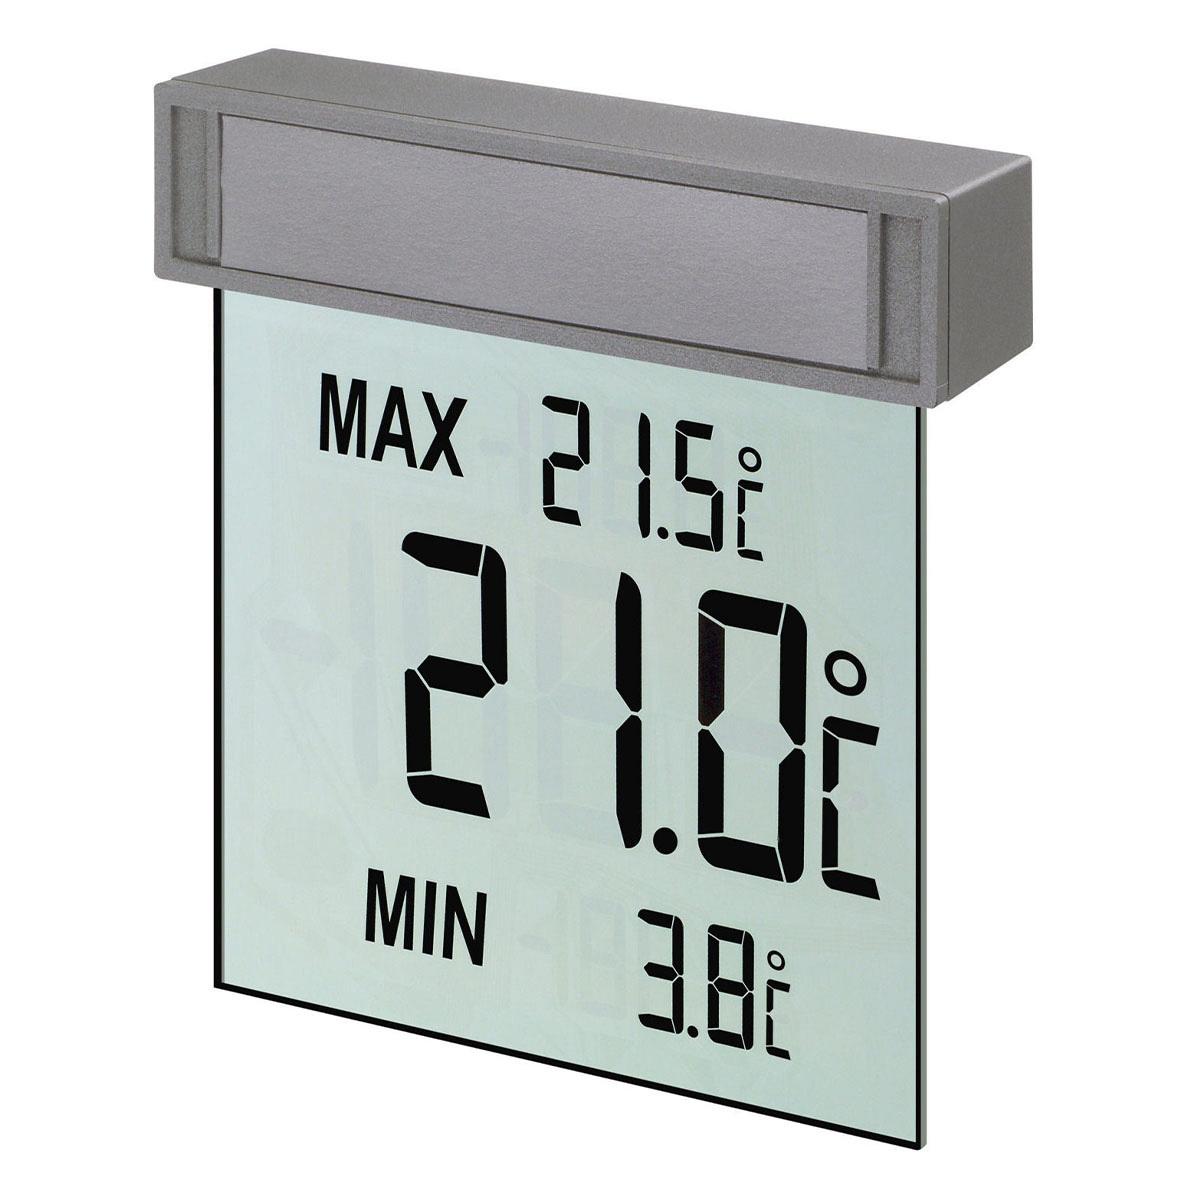 95-2009-tfa-thekendisplay-digitale-thermometer-produkt-1200x1200px.jpg